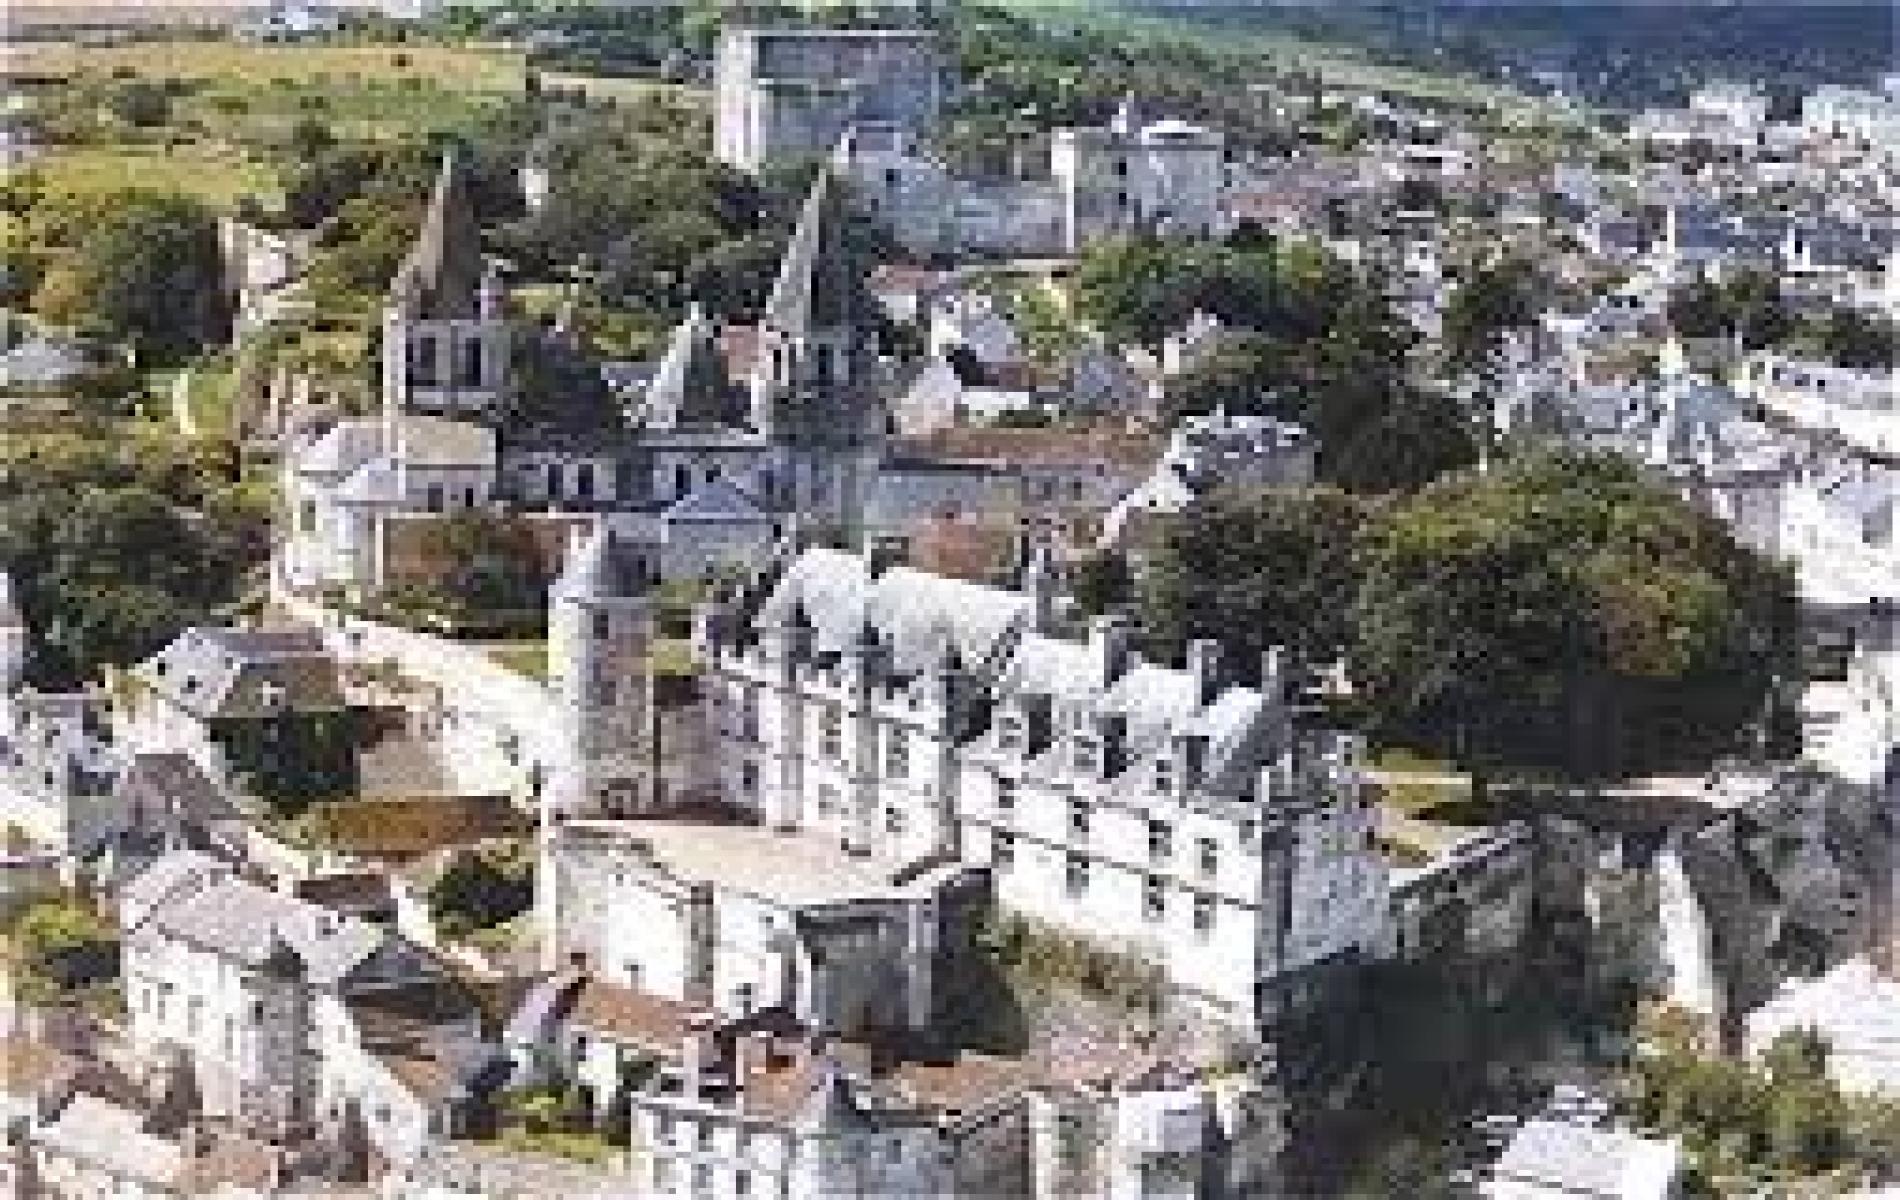 Tourism In Touraine Loire Valley